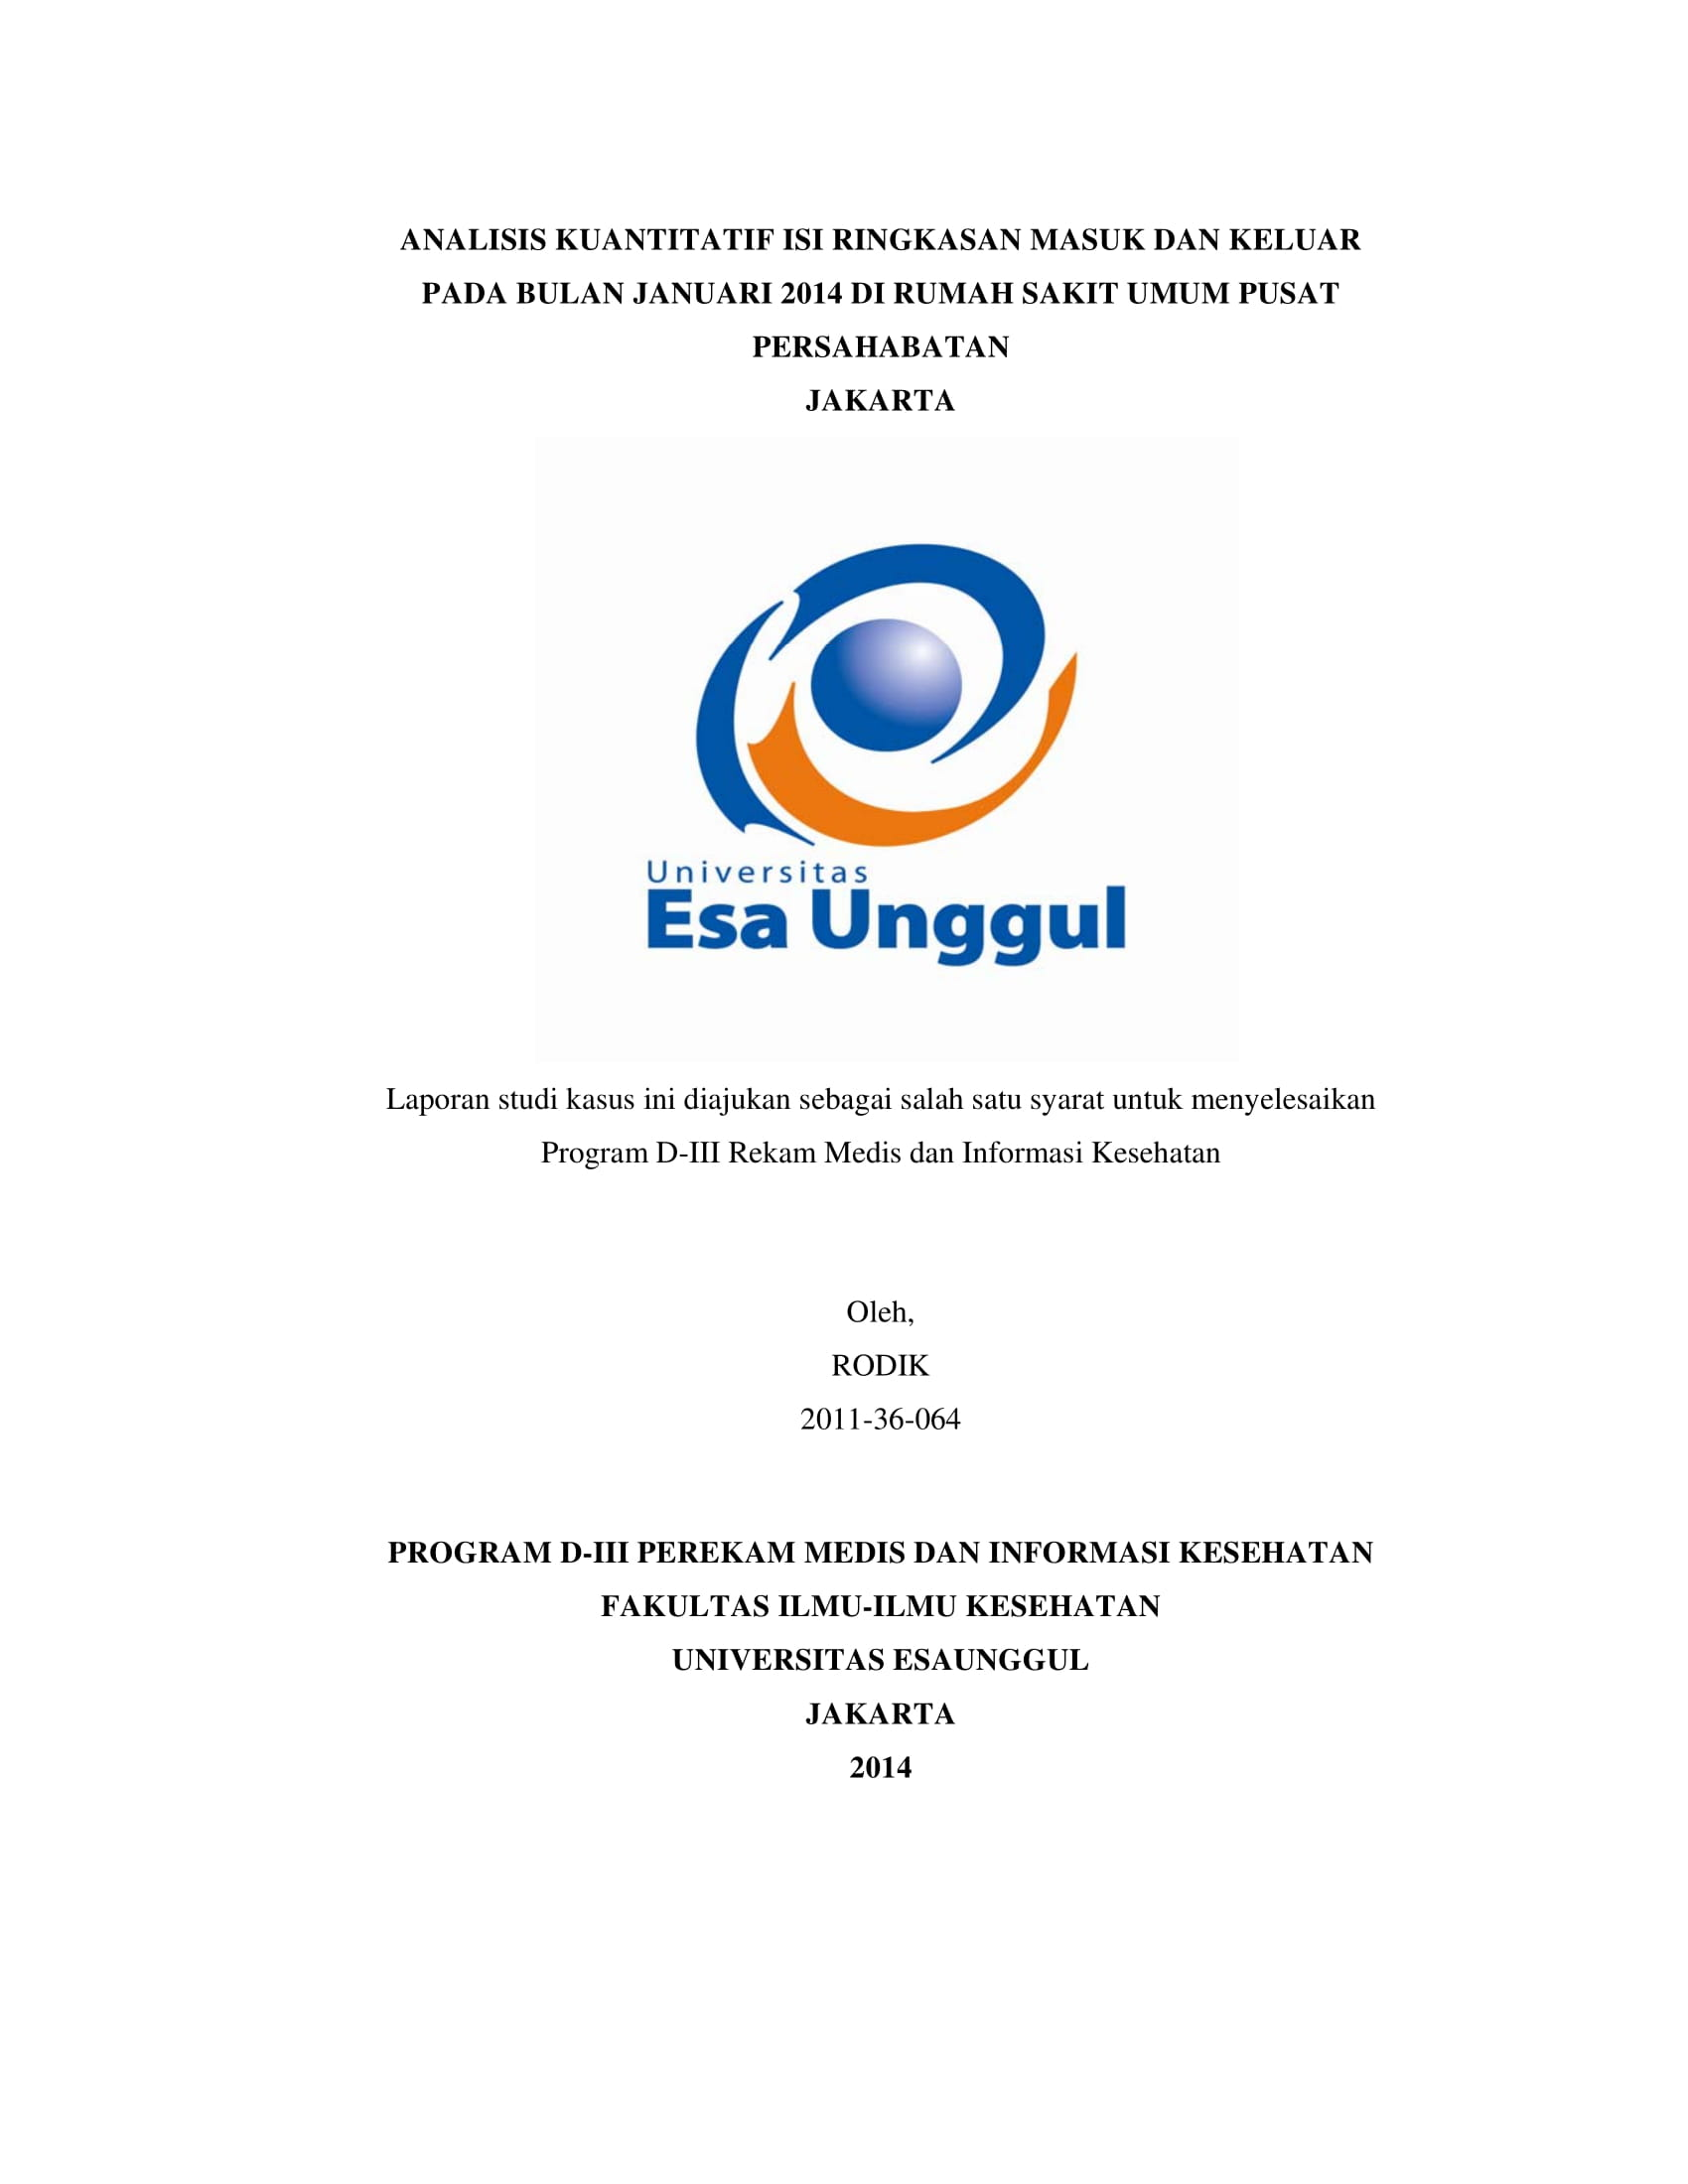 Rekam Medis Archives Universitas Esa Unggul